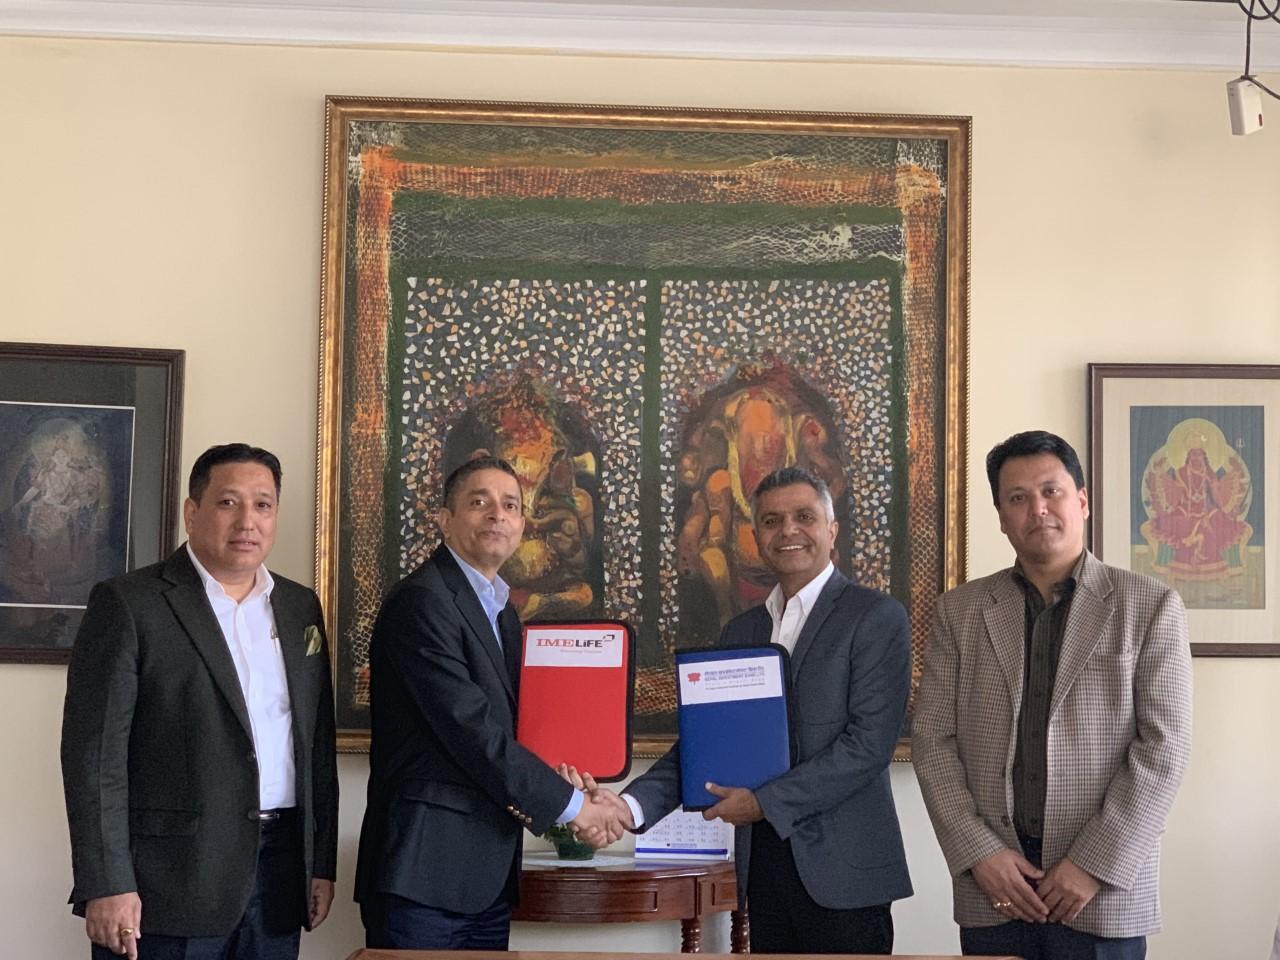 आइएमई लाइफइन्स्योरेन्स र नेपाल इन्भेष्टमेन्टबीच बैंक अस्योरेन्स सम्झौता